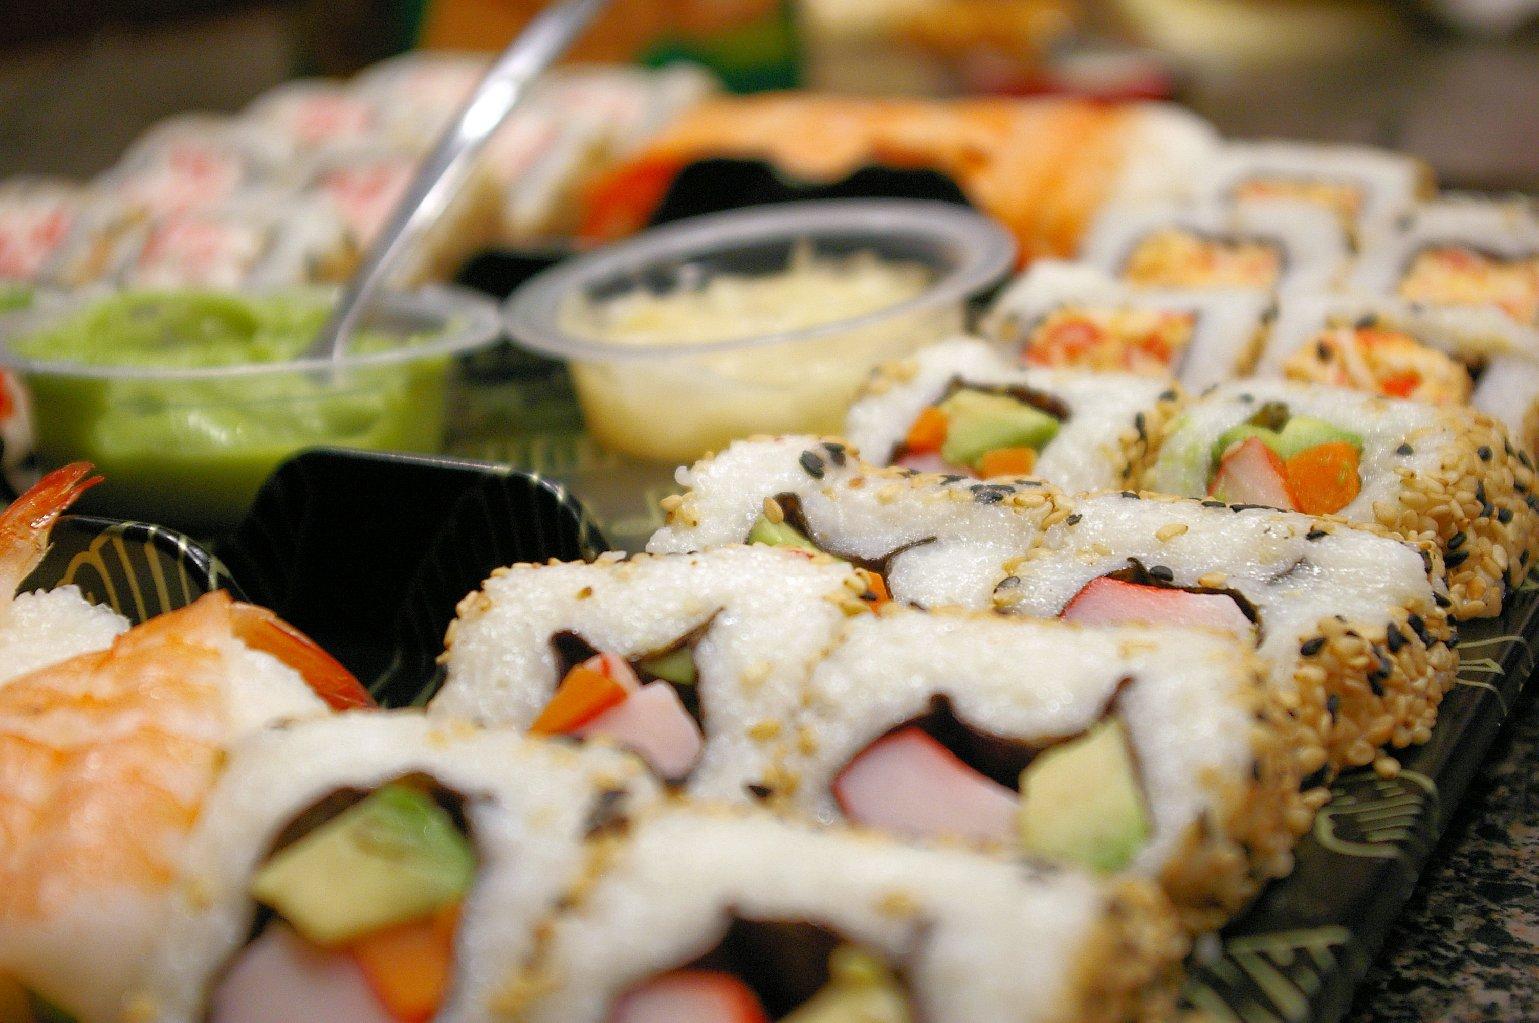 Legislator Washes His Hands of Unpopular Restaurant Glove Law